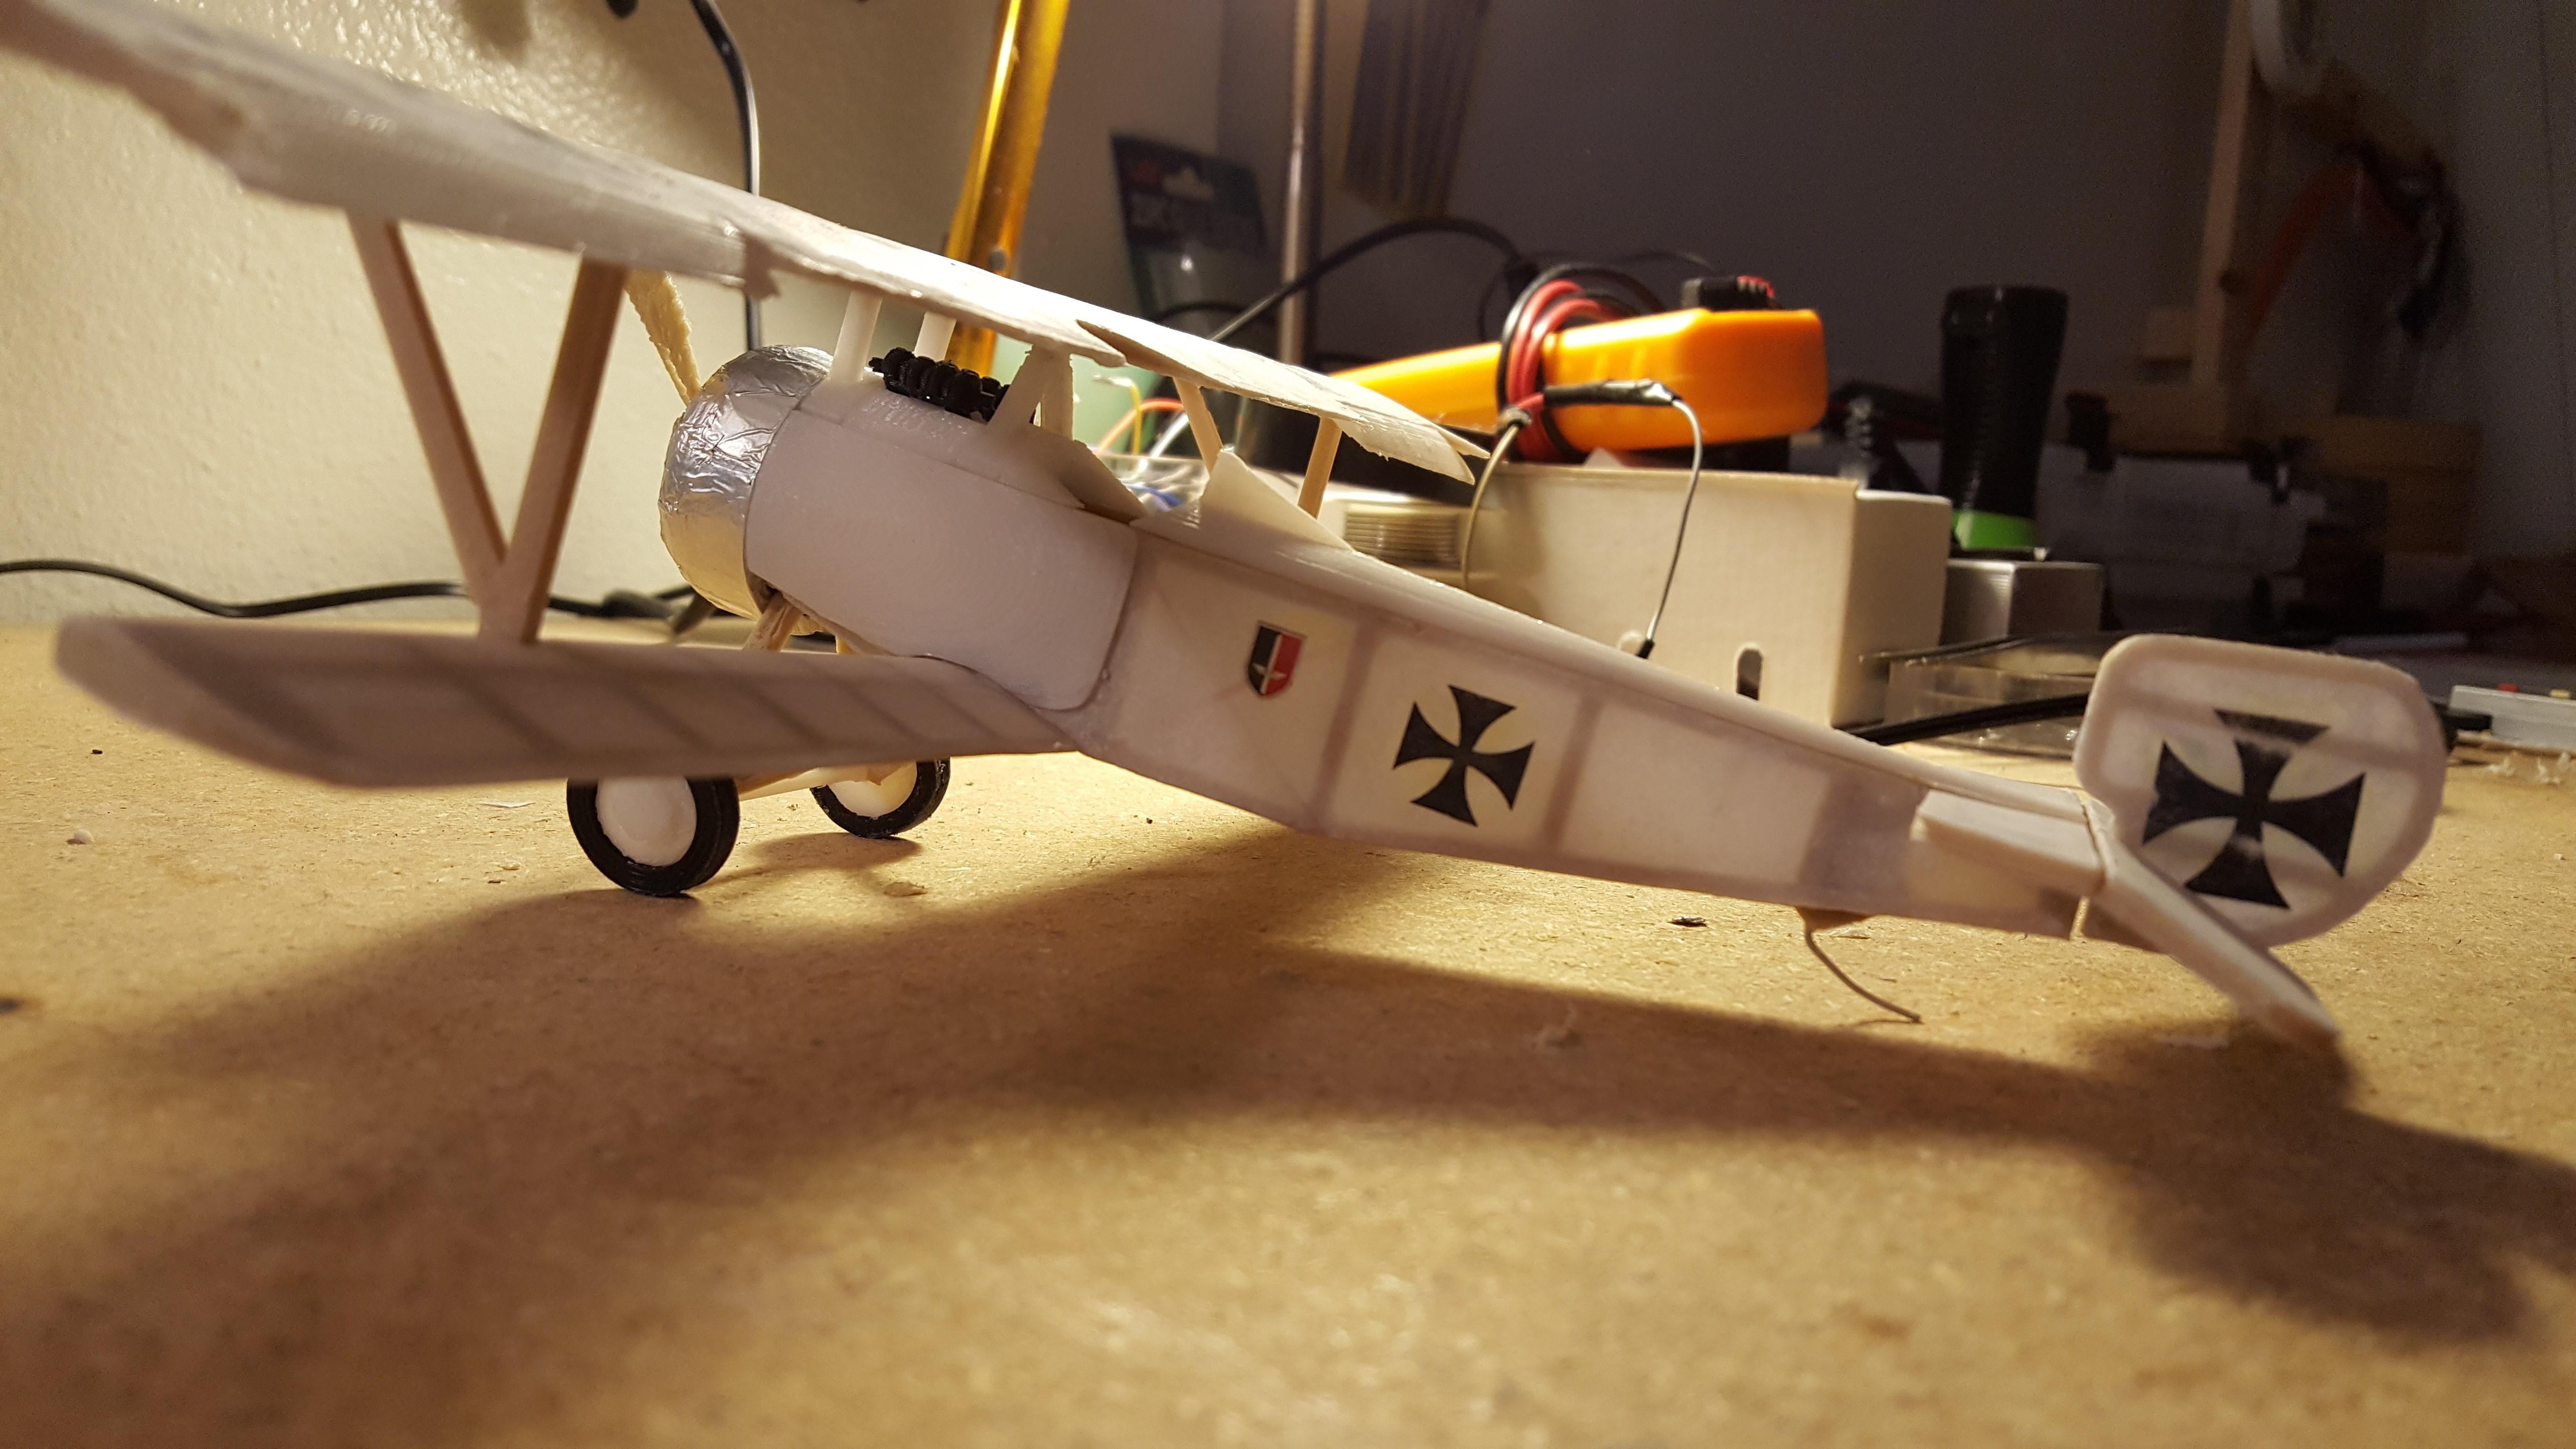 20171014_003649.jpg Download STL file Nieuport 17, WW1 Warplane • 3D printing design, JimmyHo